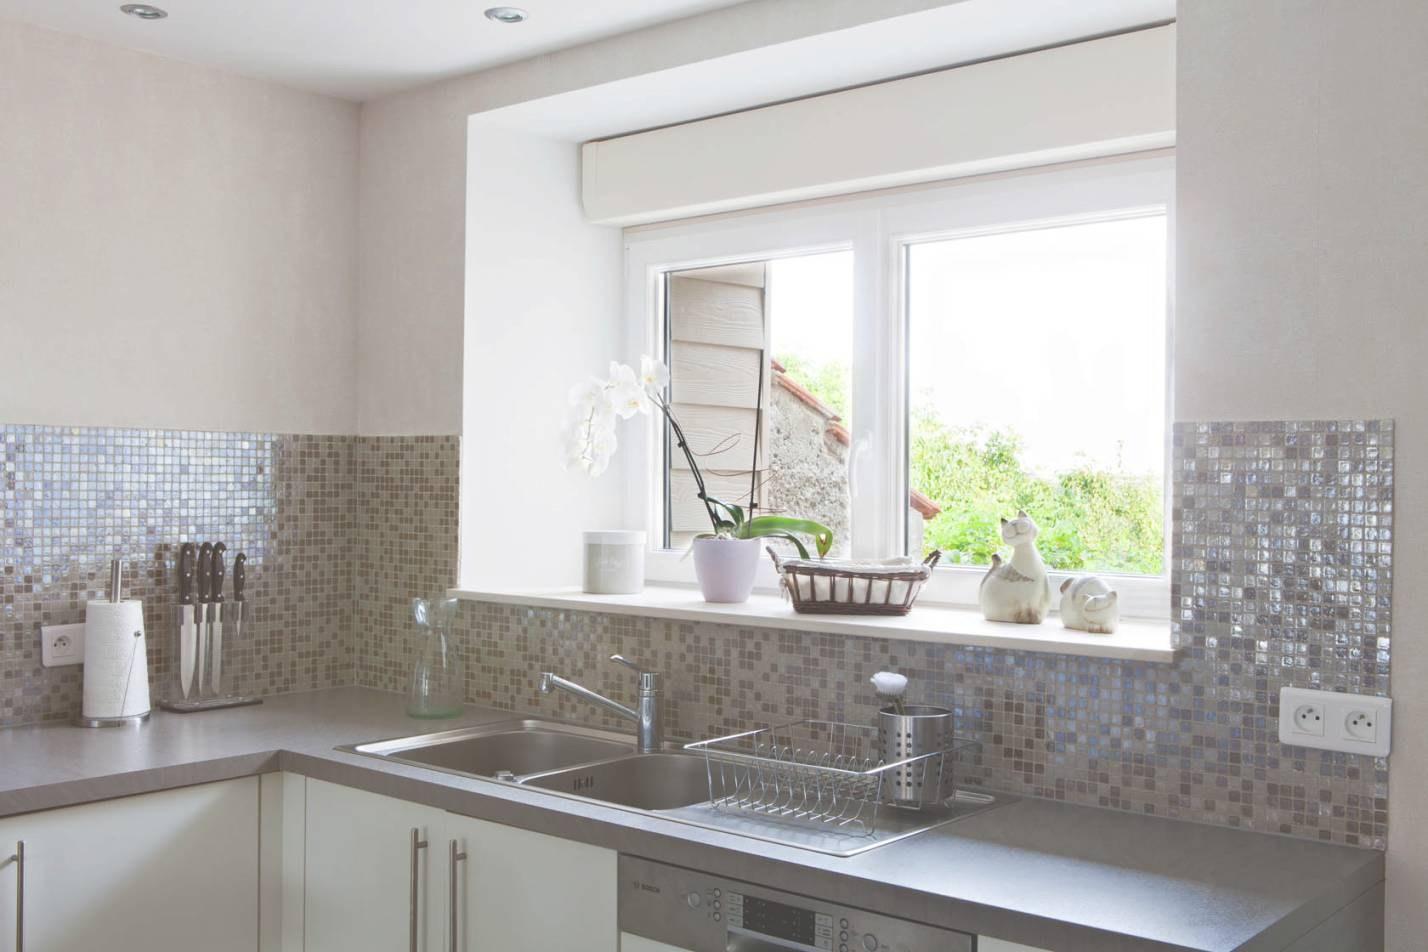 credence design id e pour cuisine. Black Bedroom Furniture Sets. Home Design Ideas